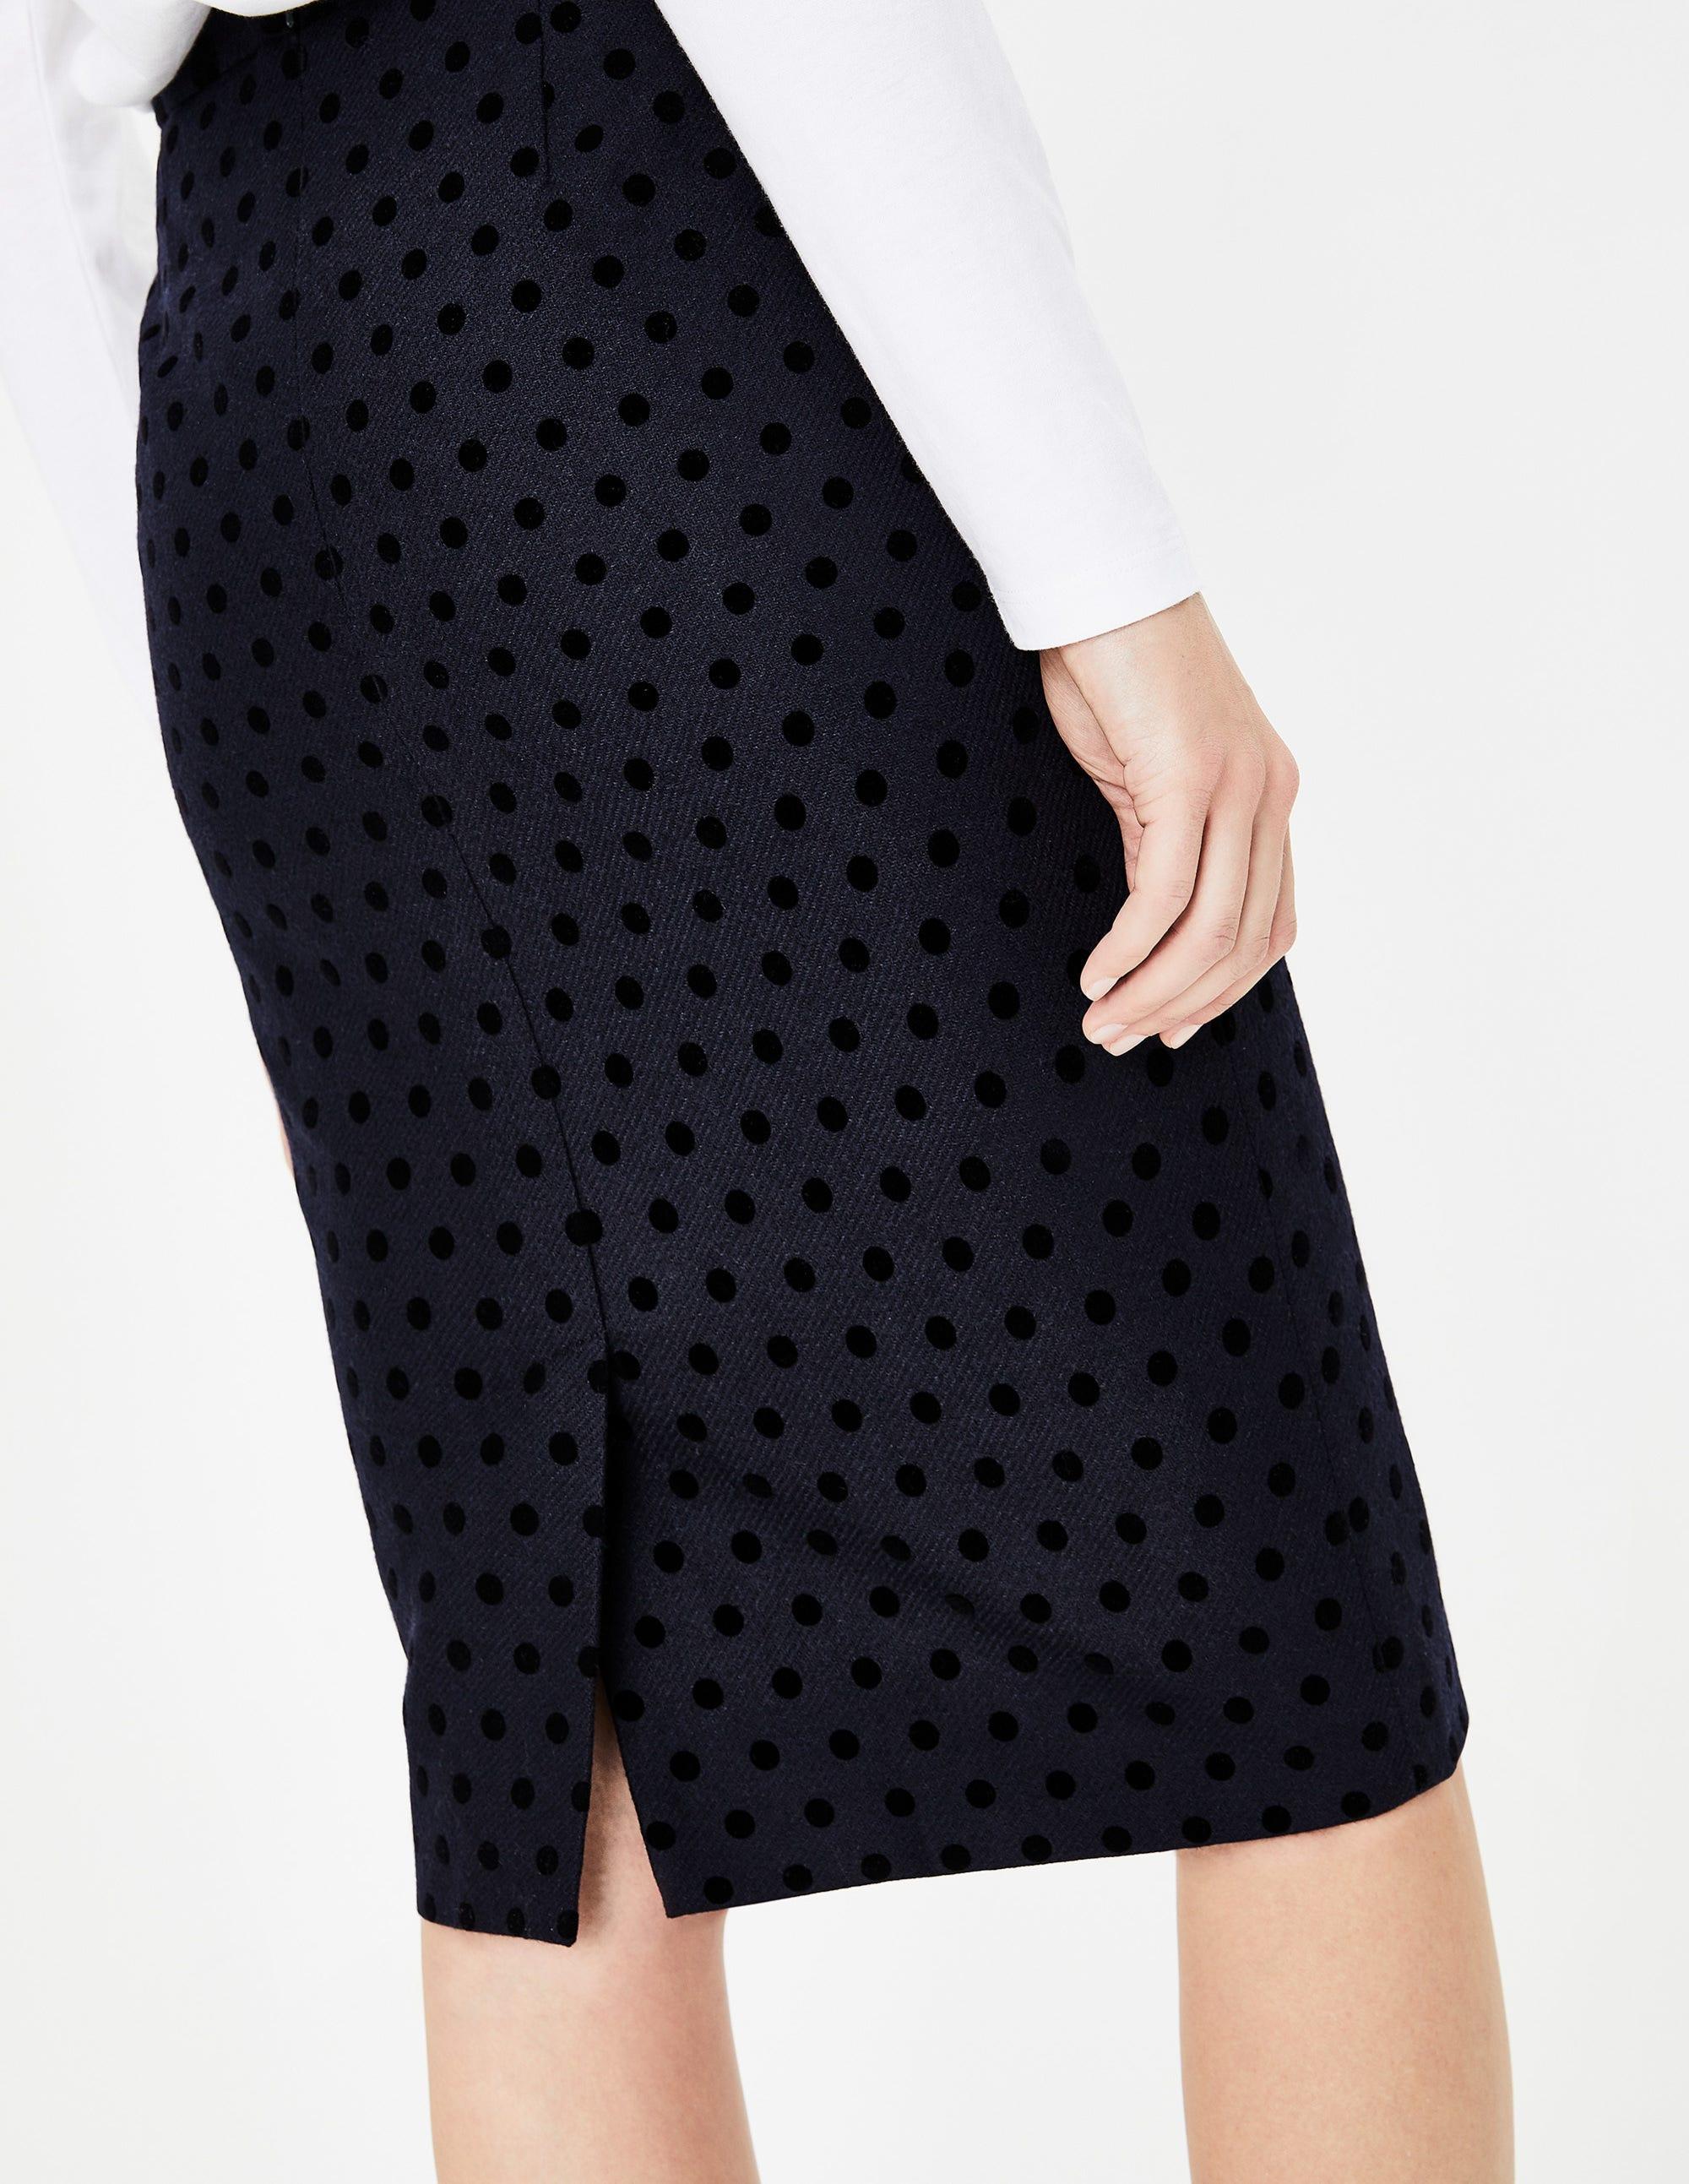 41039e4e9 Freya Pencil Skirt - Navy W/Black Flocked Spot | Boden US